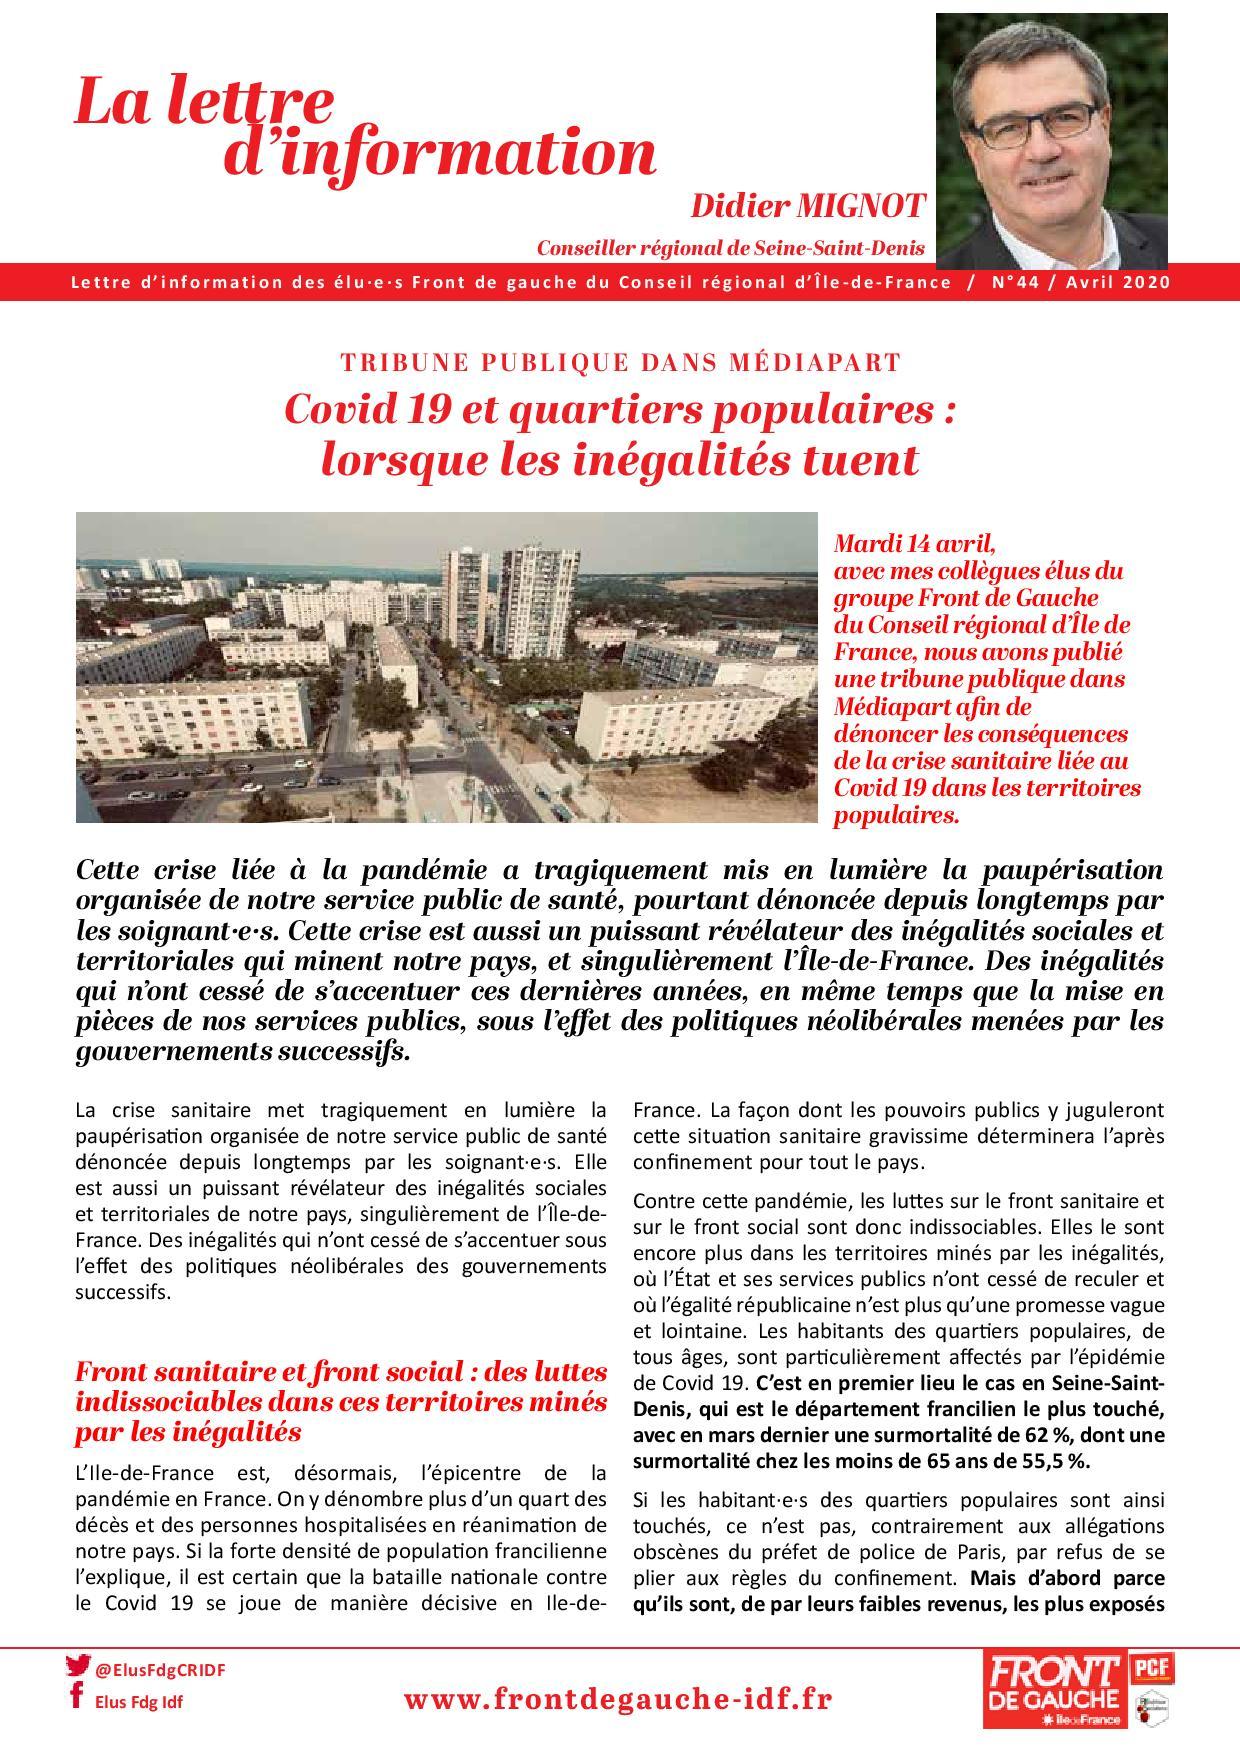 LettreInfo_DidierMignotMediapart_avril2020-page-001.jpg